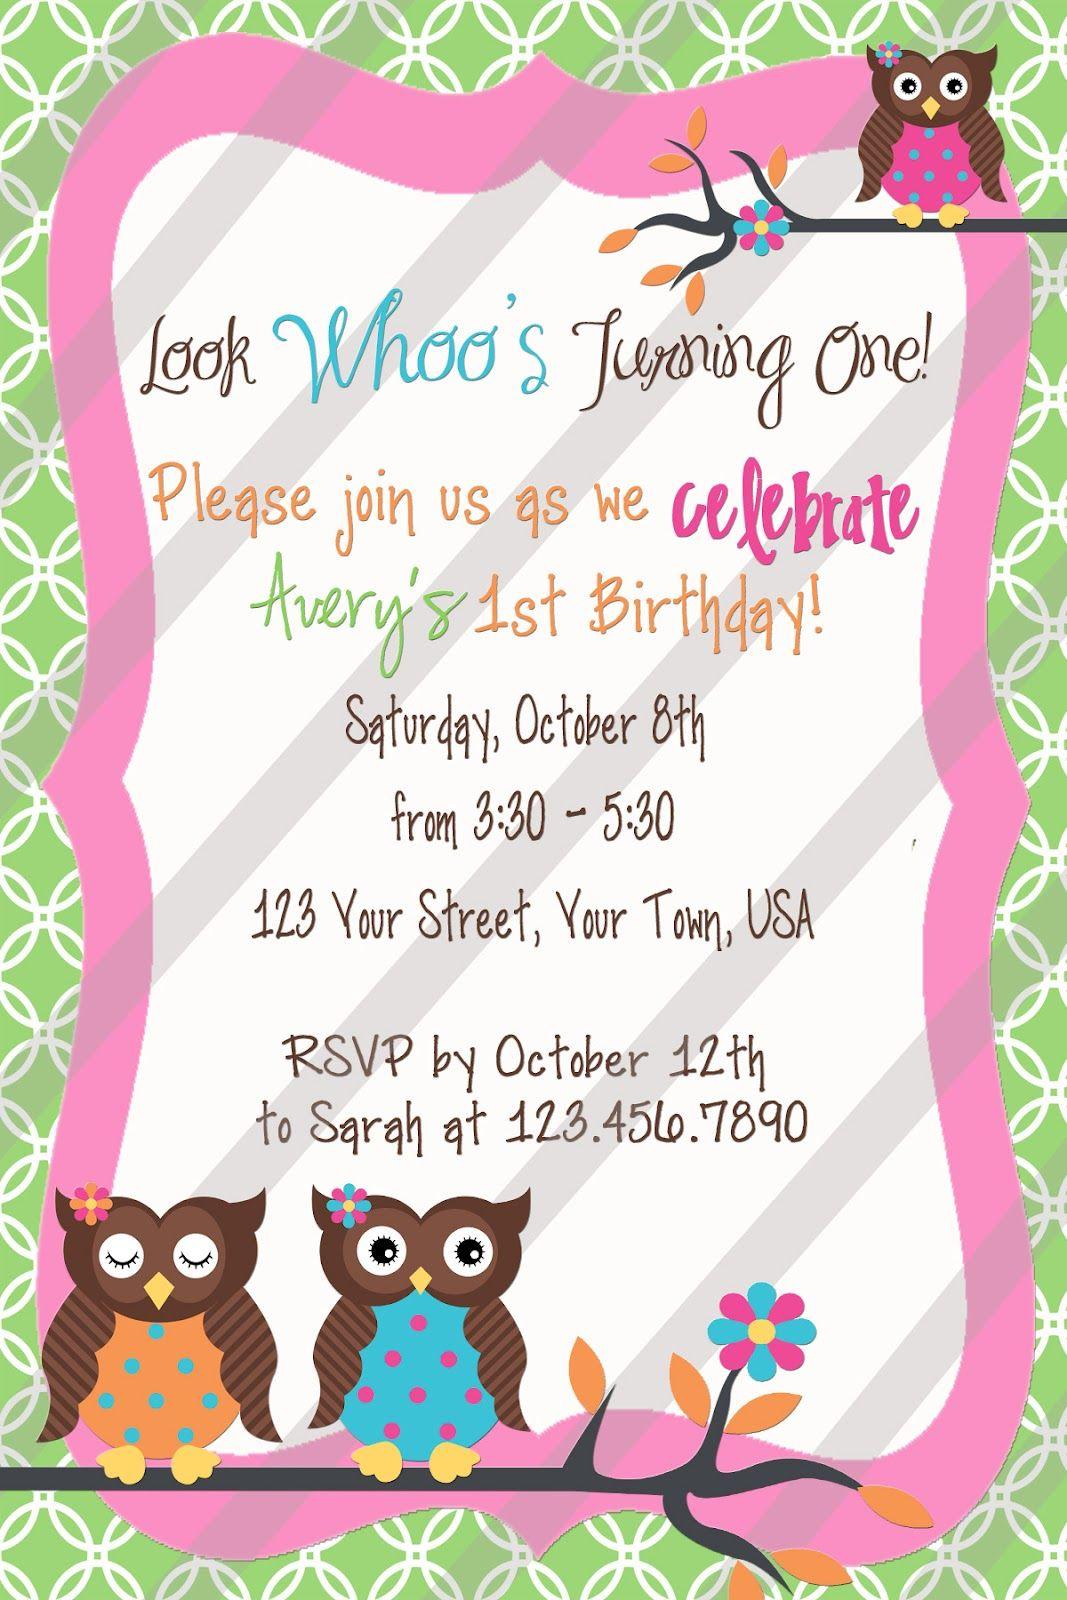 Girly Owl Invitation | Past Birthday Parties | Pinterest | Owl ...